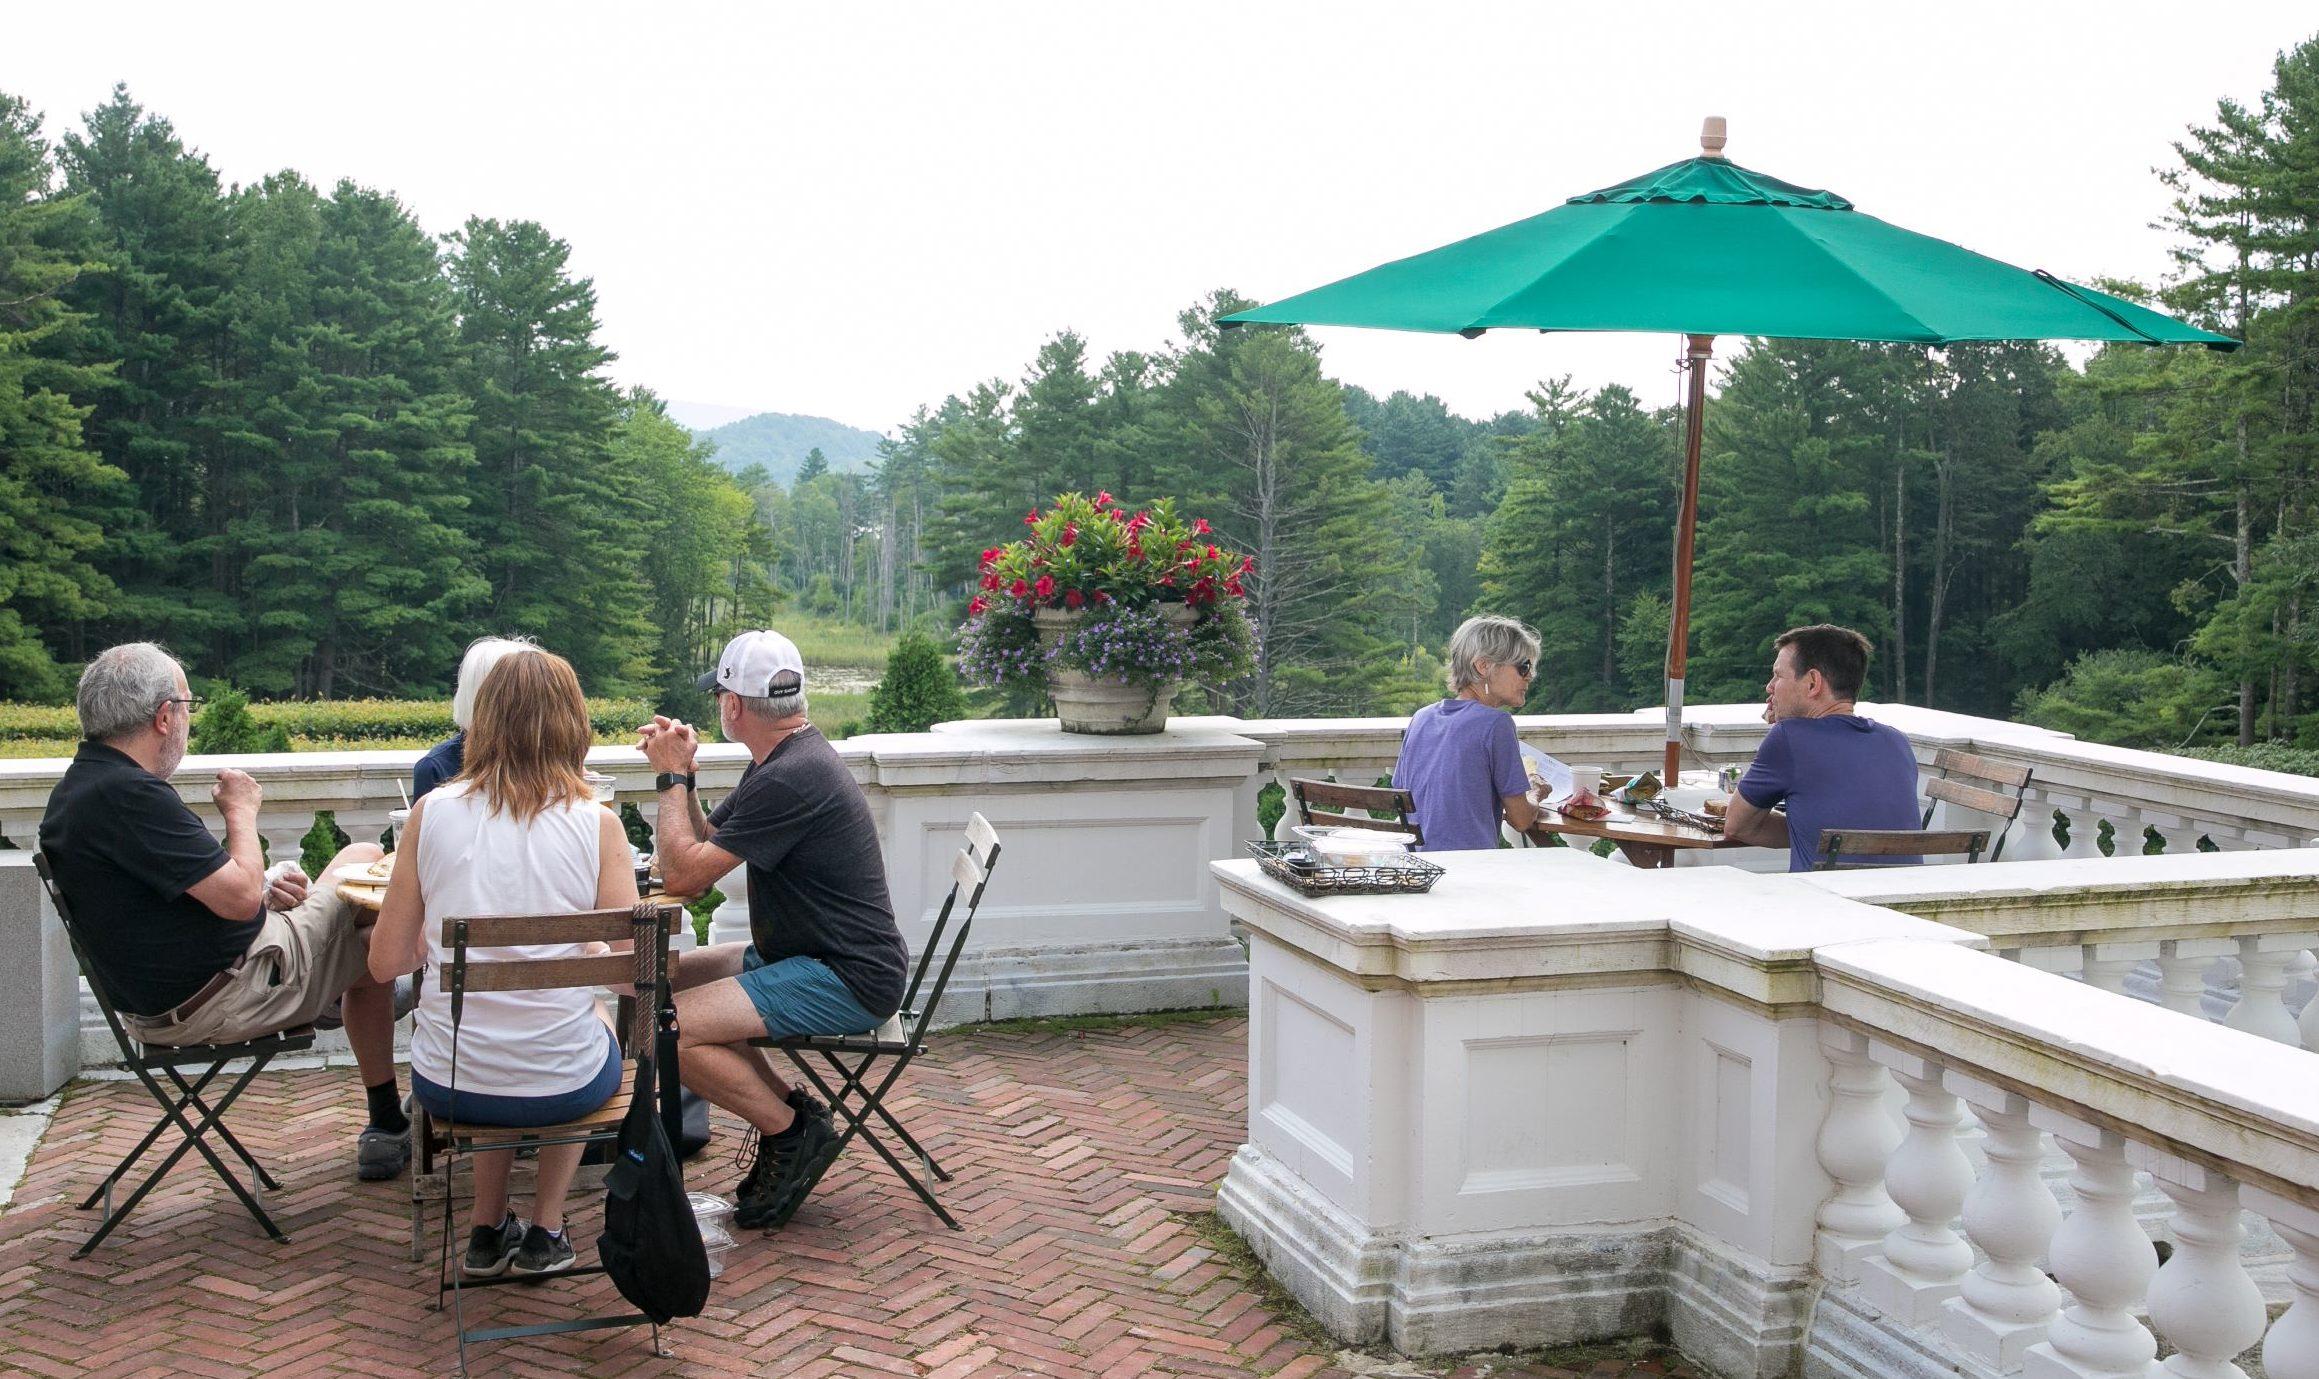 Visitors enjoying lunch under an umbrella at The Terrace Café.